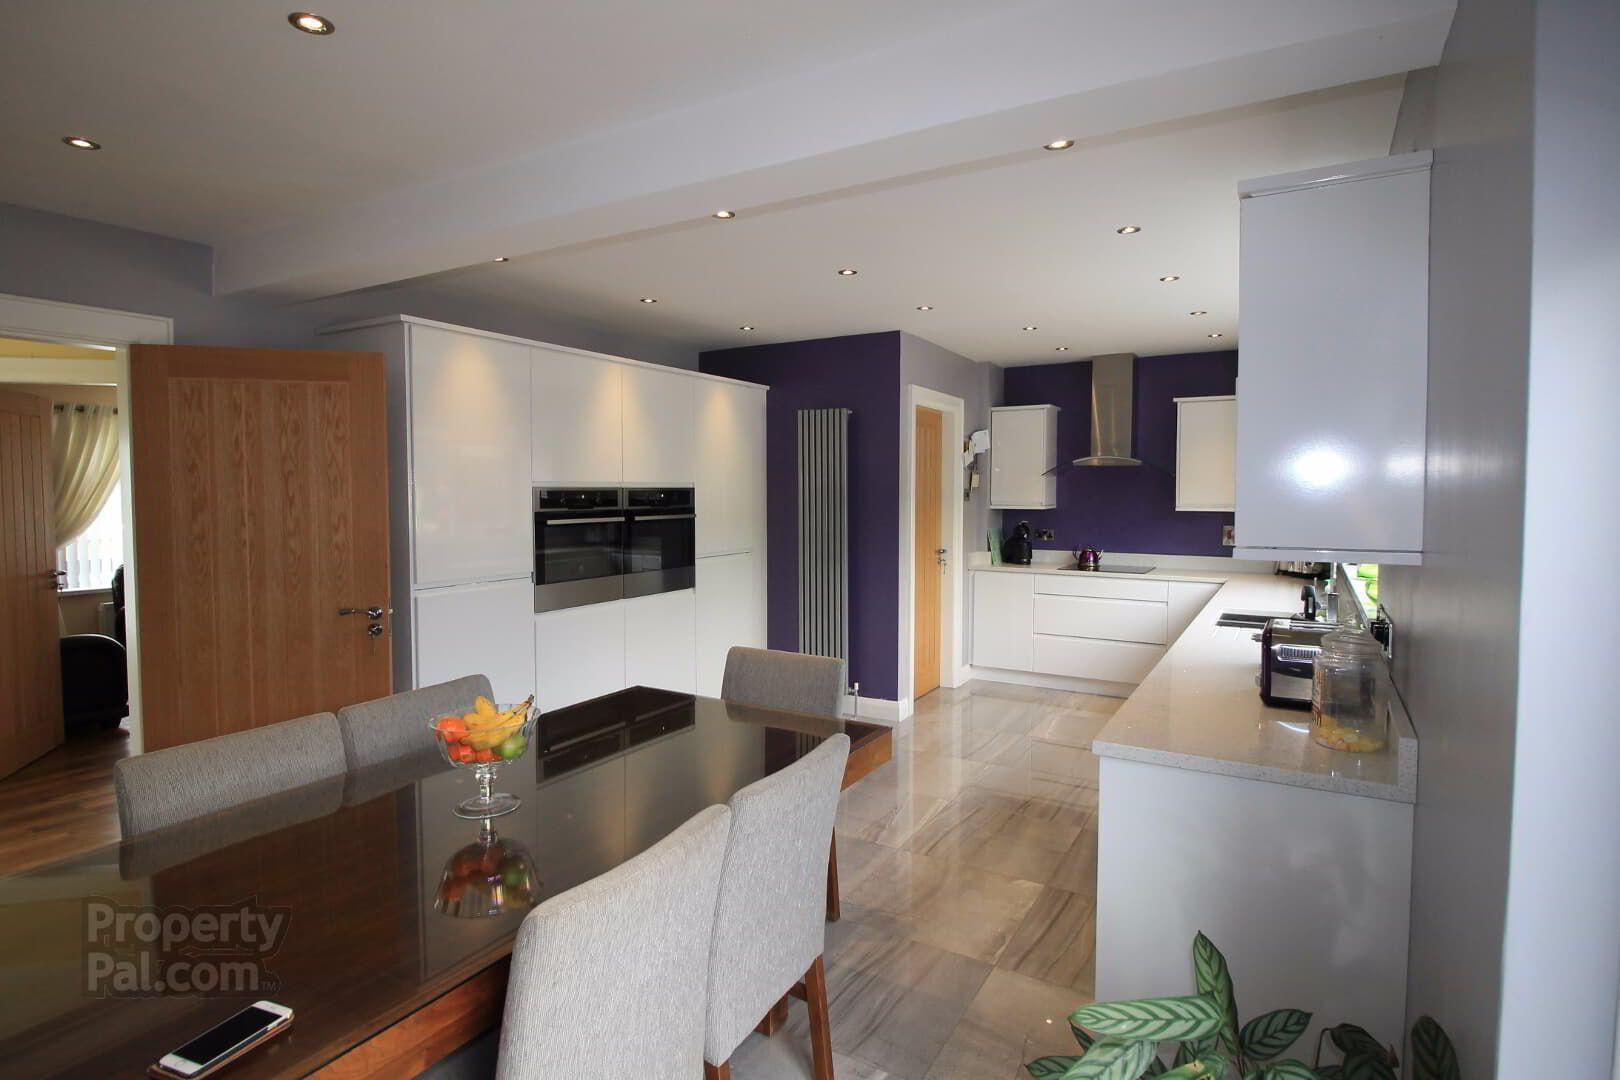 36 Burnside Manor, Derry kitchen Property for sale